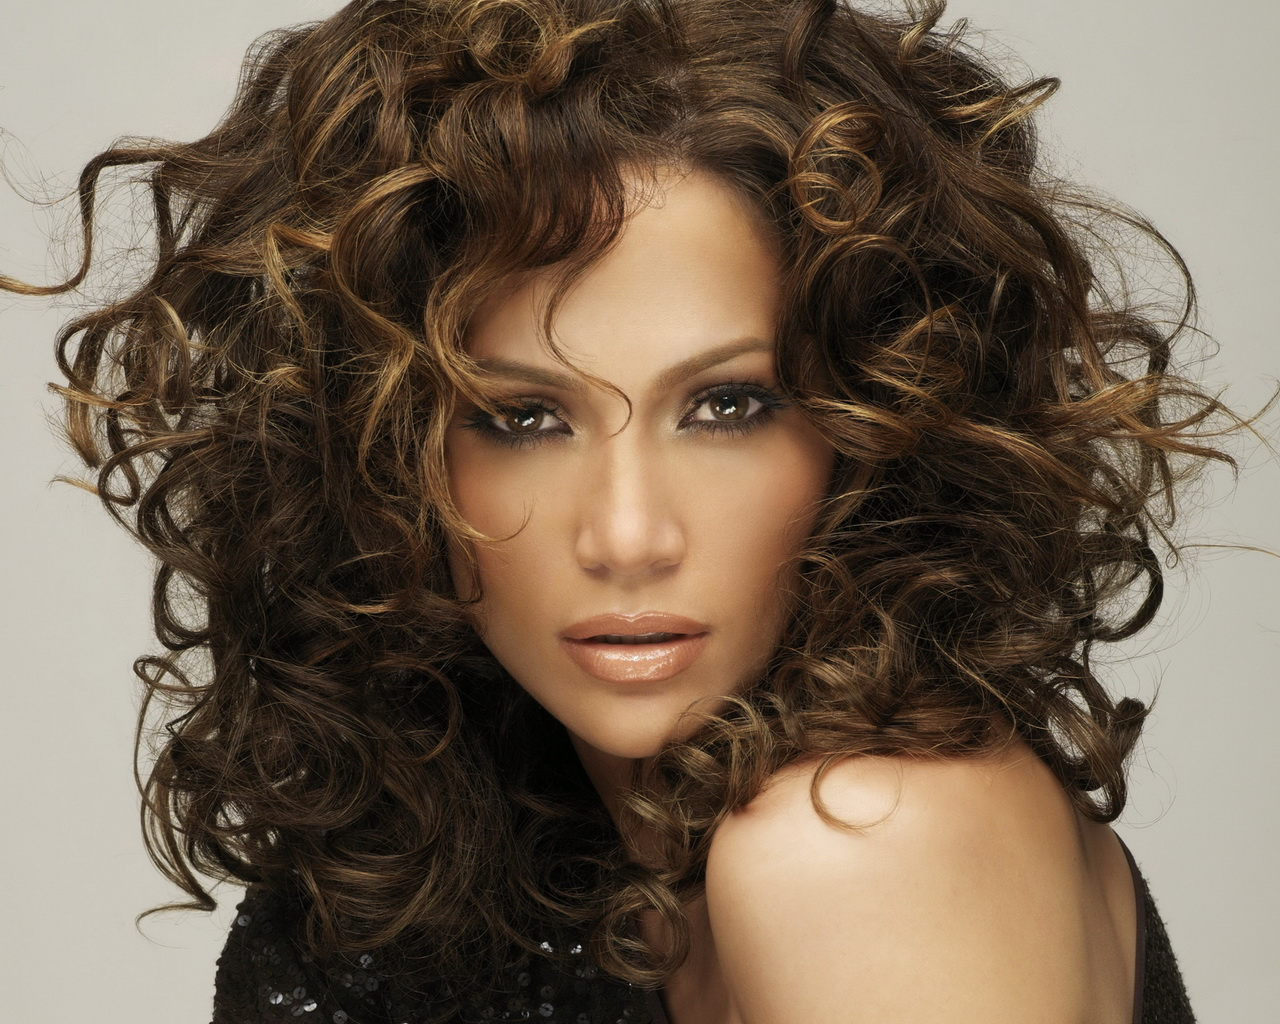 ¿Las extensiones tumban el pelo? ¡Pregúntenle a Jennifer Lopez!